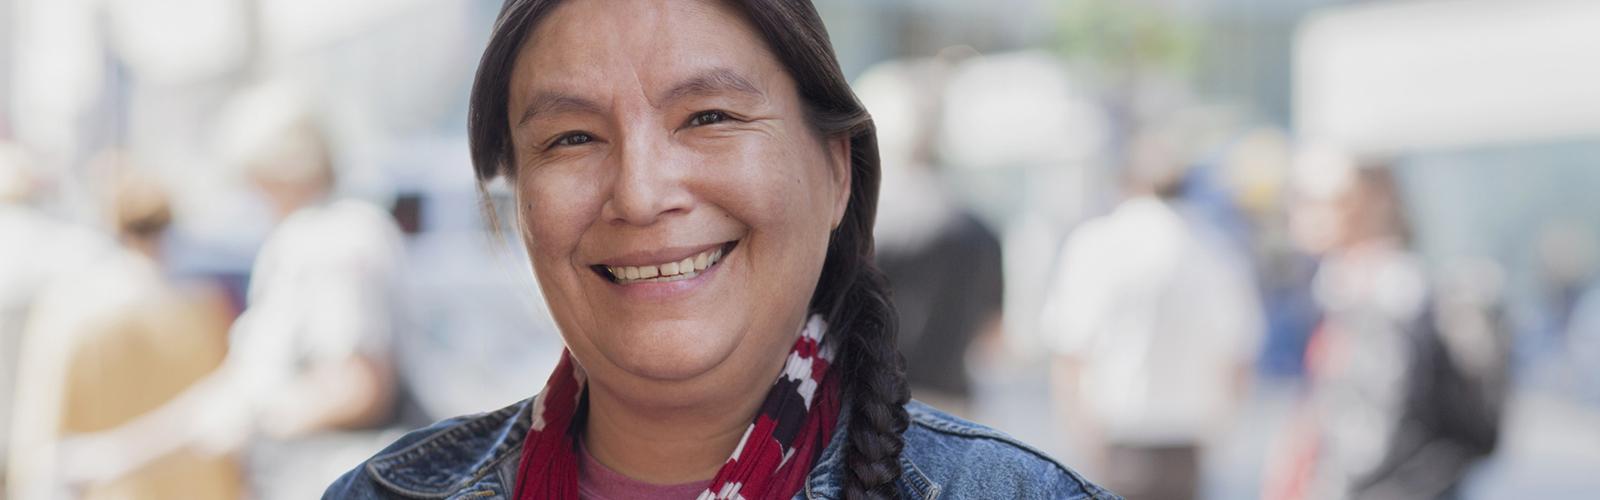 Native American woman smiles